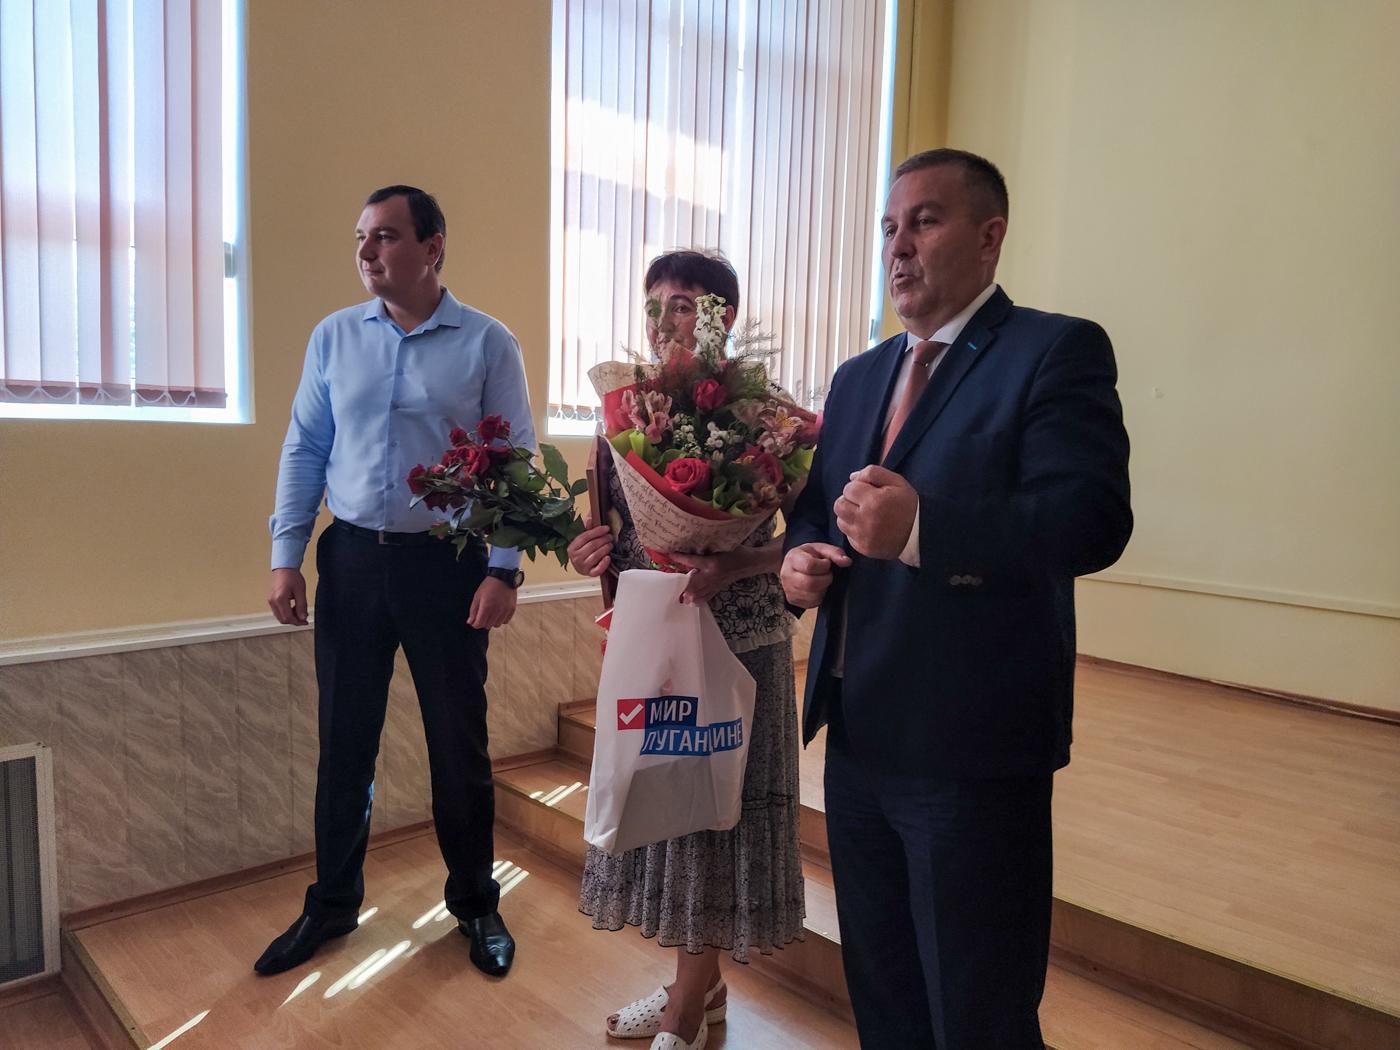 Представителю ОД «Мир Луганщине» вручили грамоту в Перевальске